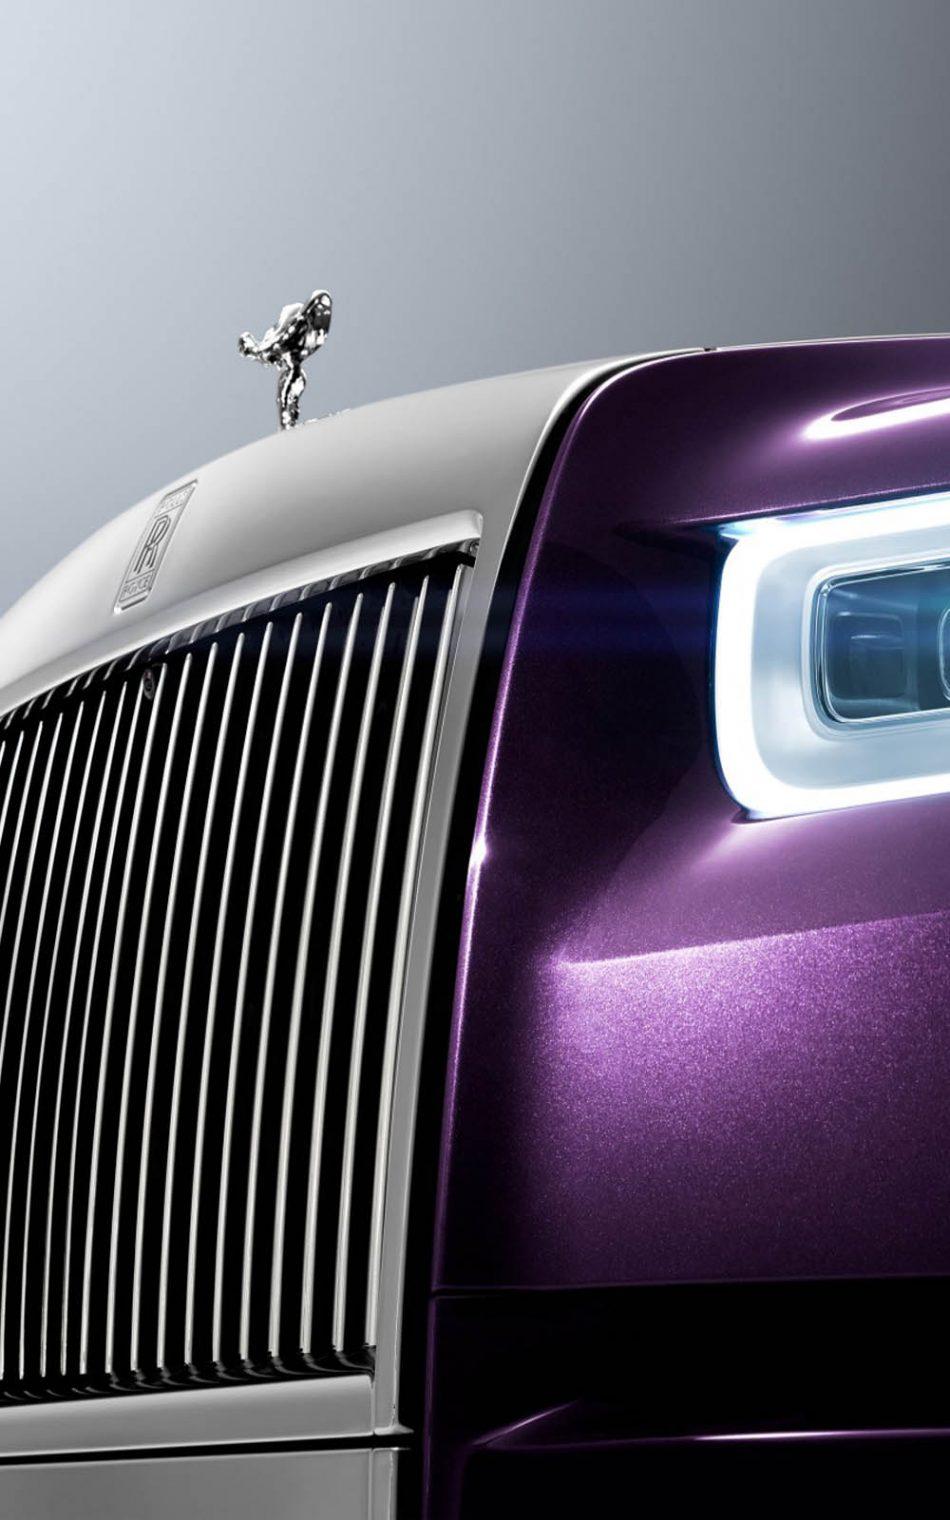 Download Rolls Royce Phantom Ewb Free Pure 4k Ultra Hd Mobile Wallpaper